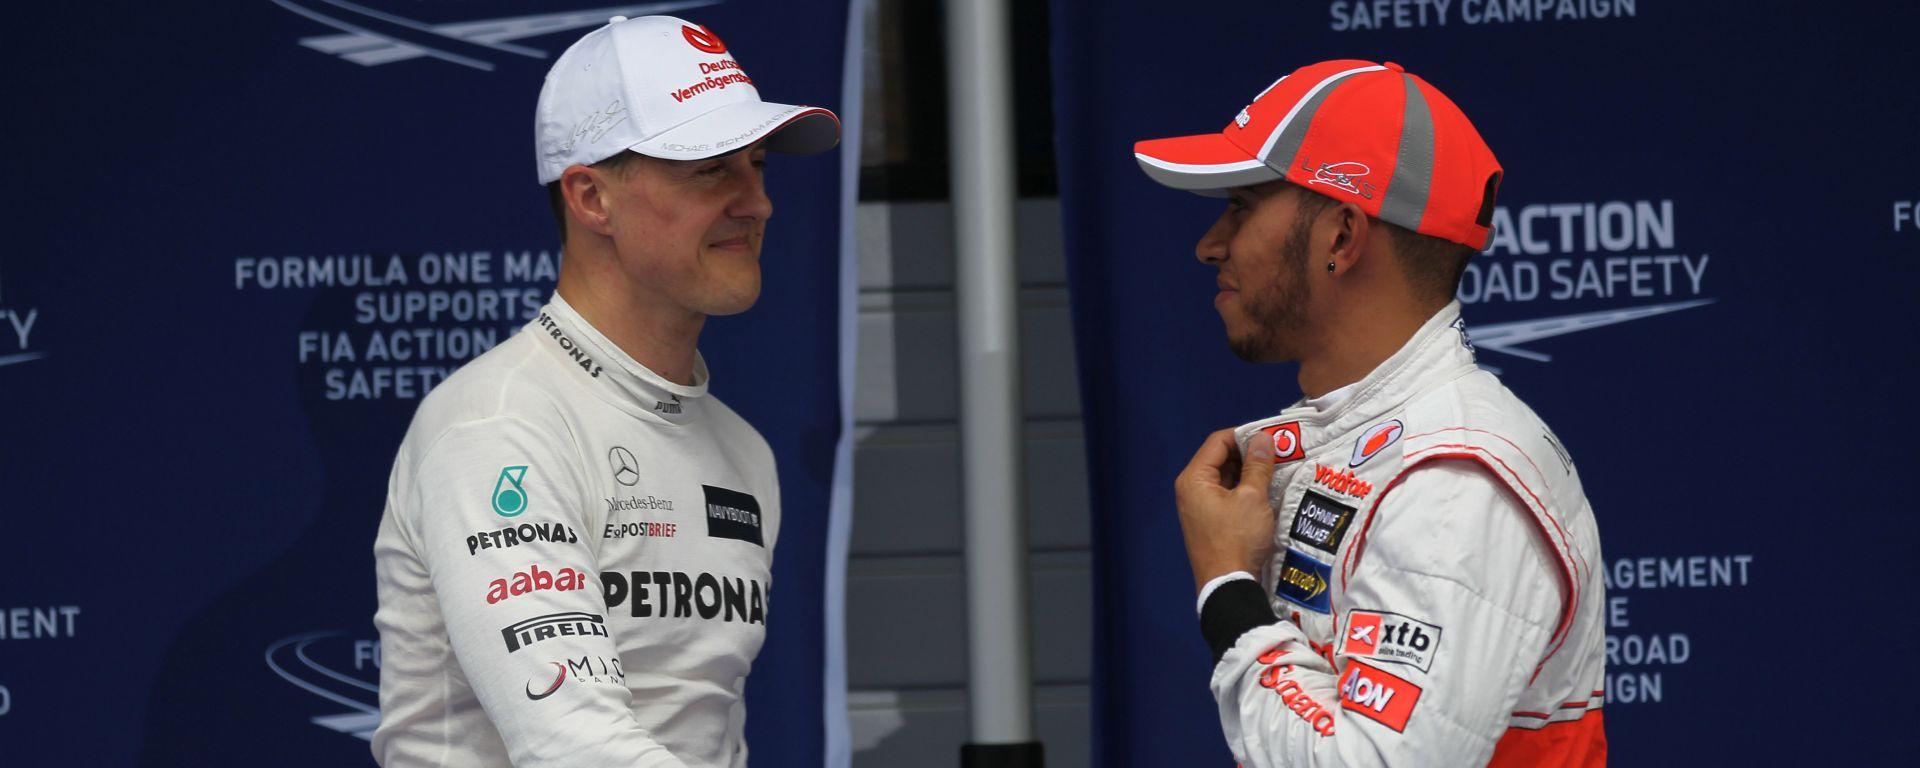 Formula 1 2012, Michael Schumacher e Lewis Hamilton